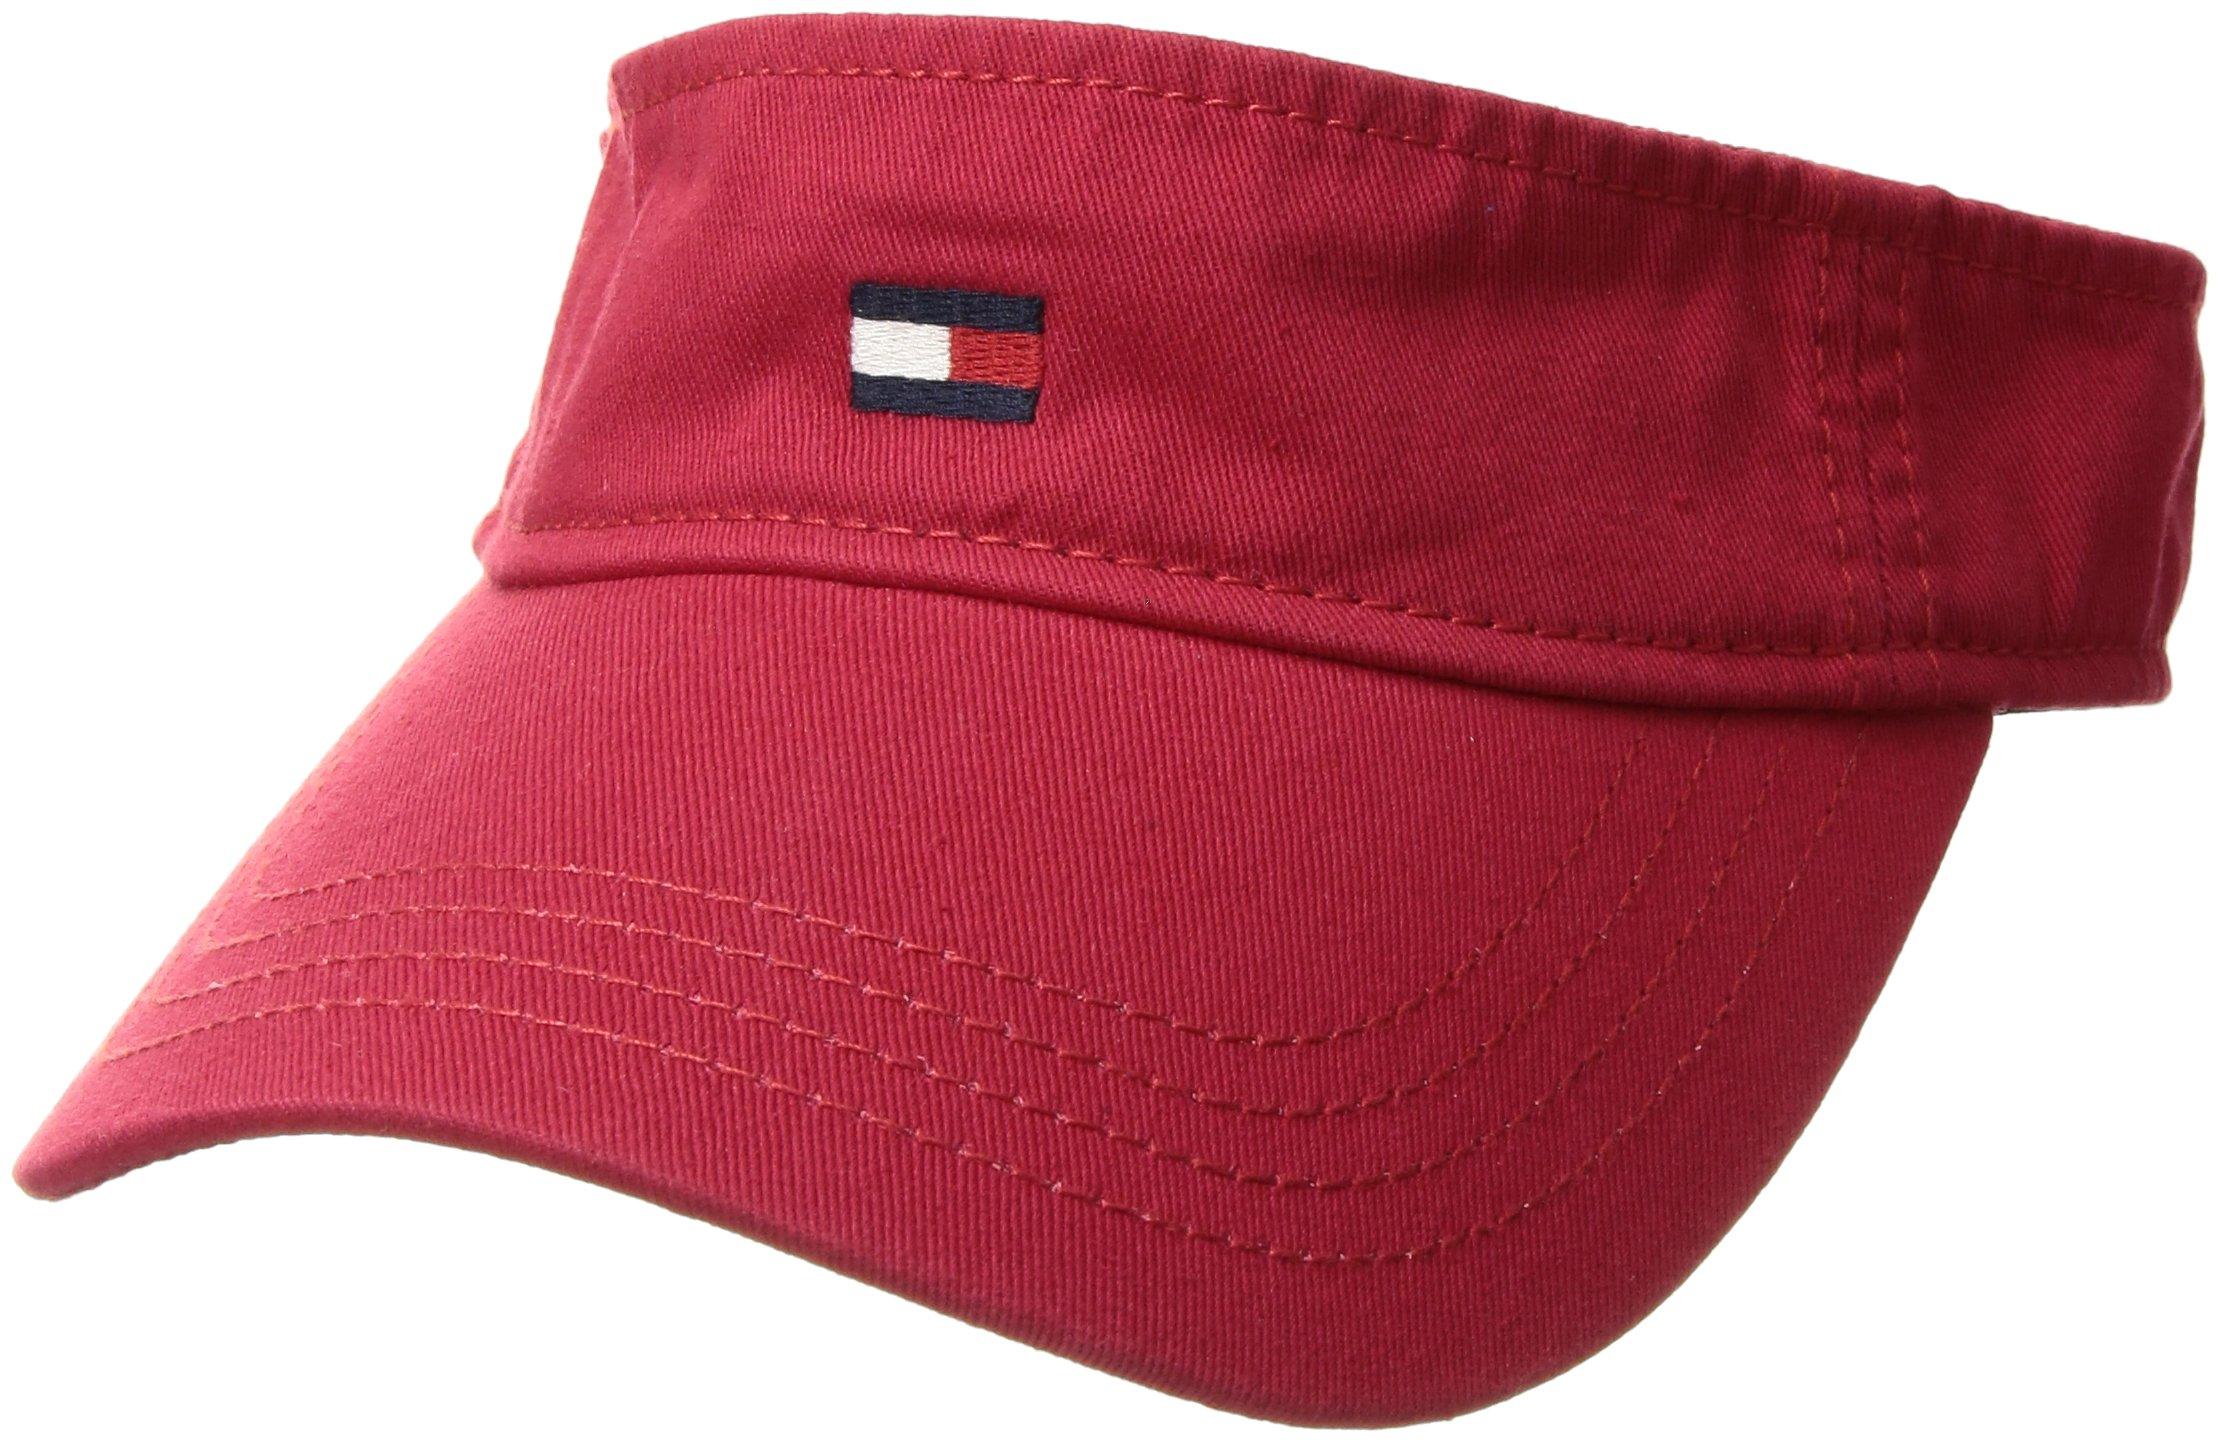 e8cd9d8d Galleon - Tommy Hilfiger Men's Dad Hat Flag Solid Cotton Visor, Tango Red,  O/S